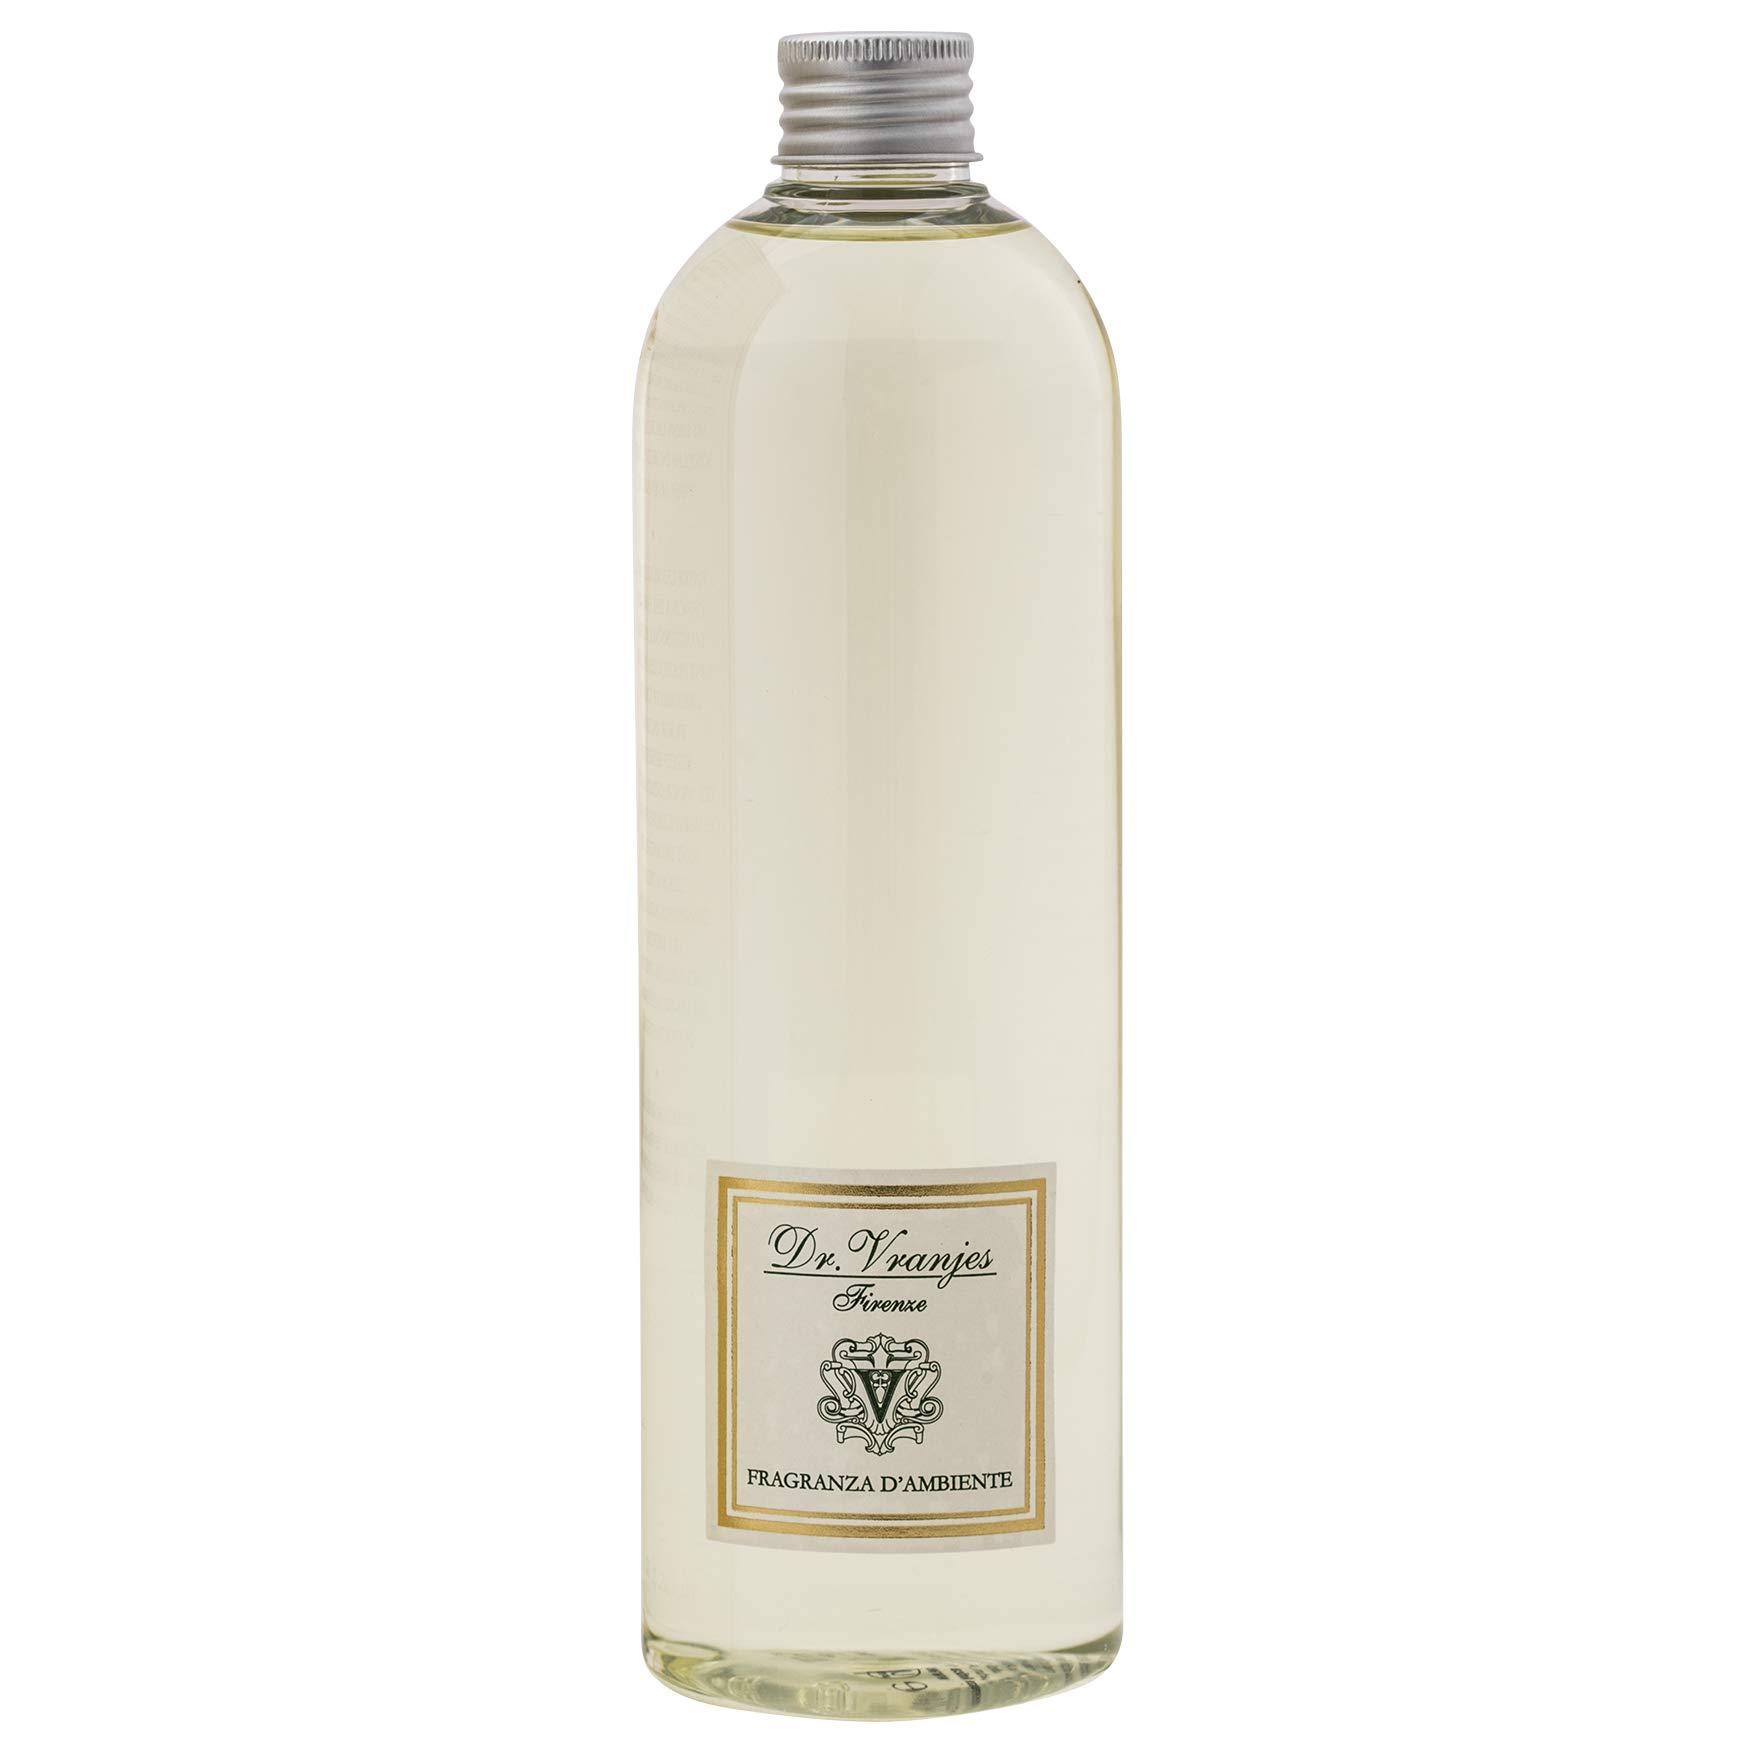 Dr. Vranjes Crystal Room Diffuser Refill 500 ml - Magnolia Orchidea (Magnolia Orchid)